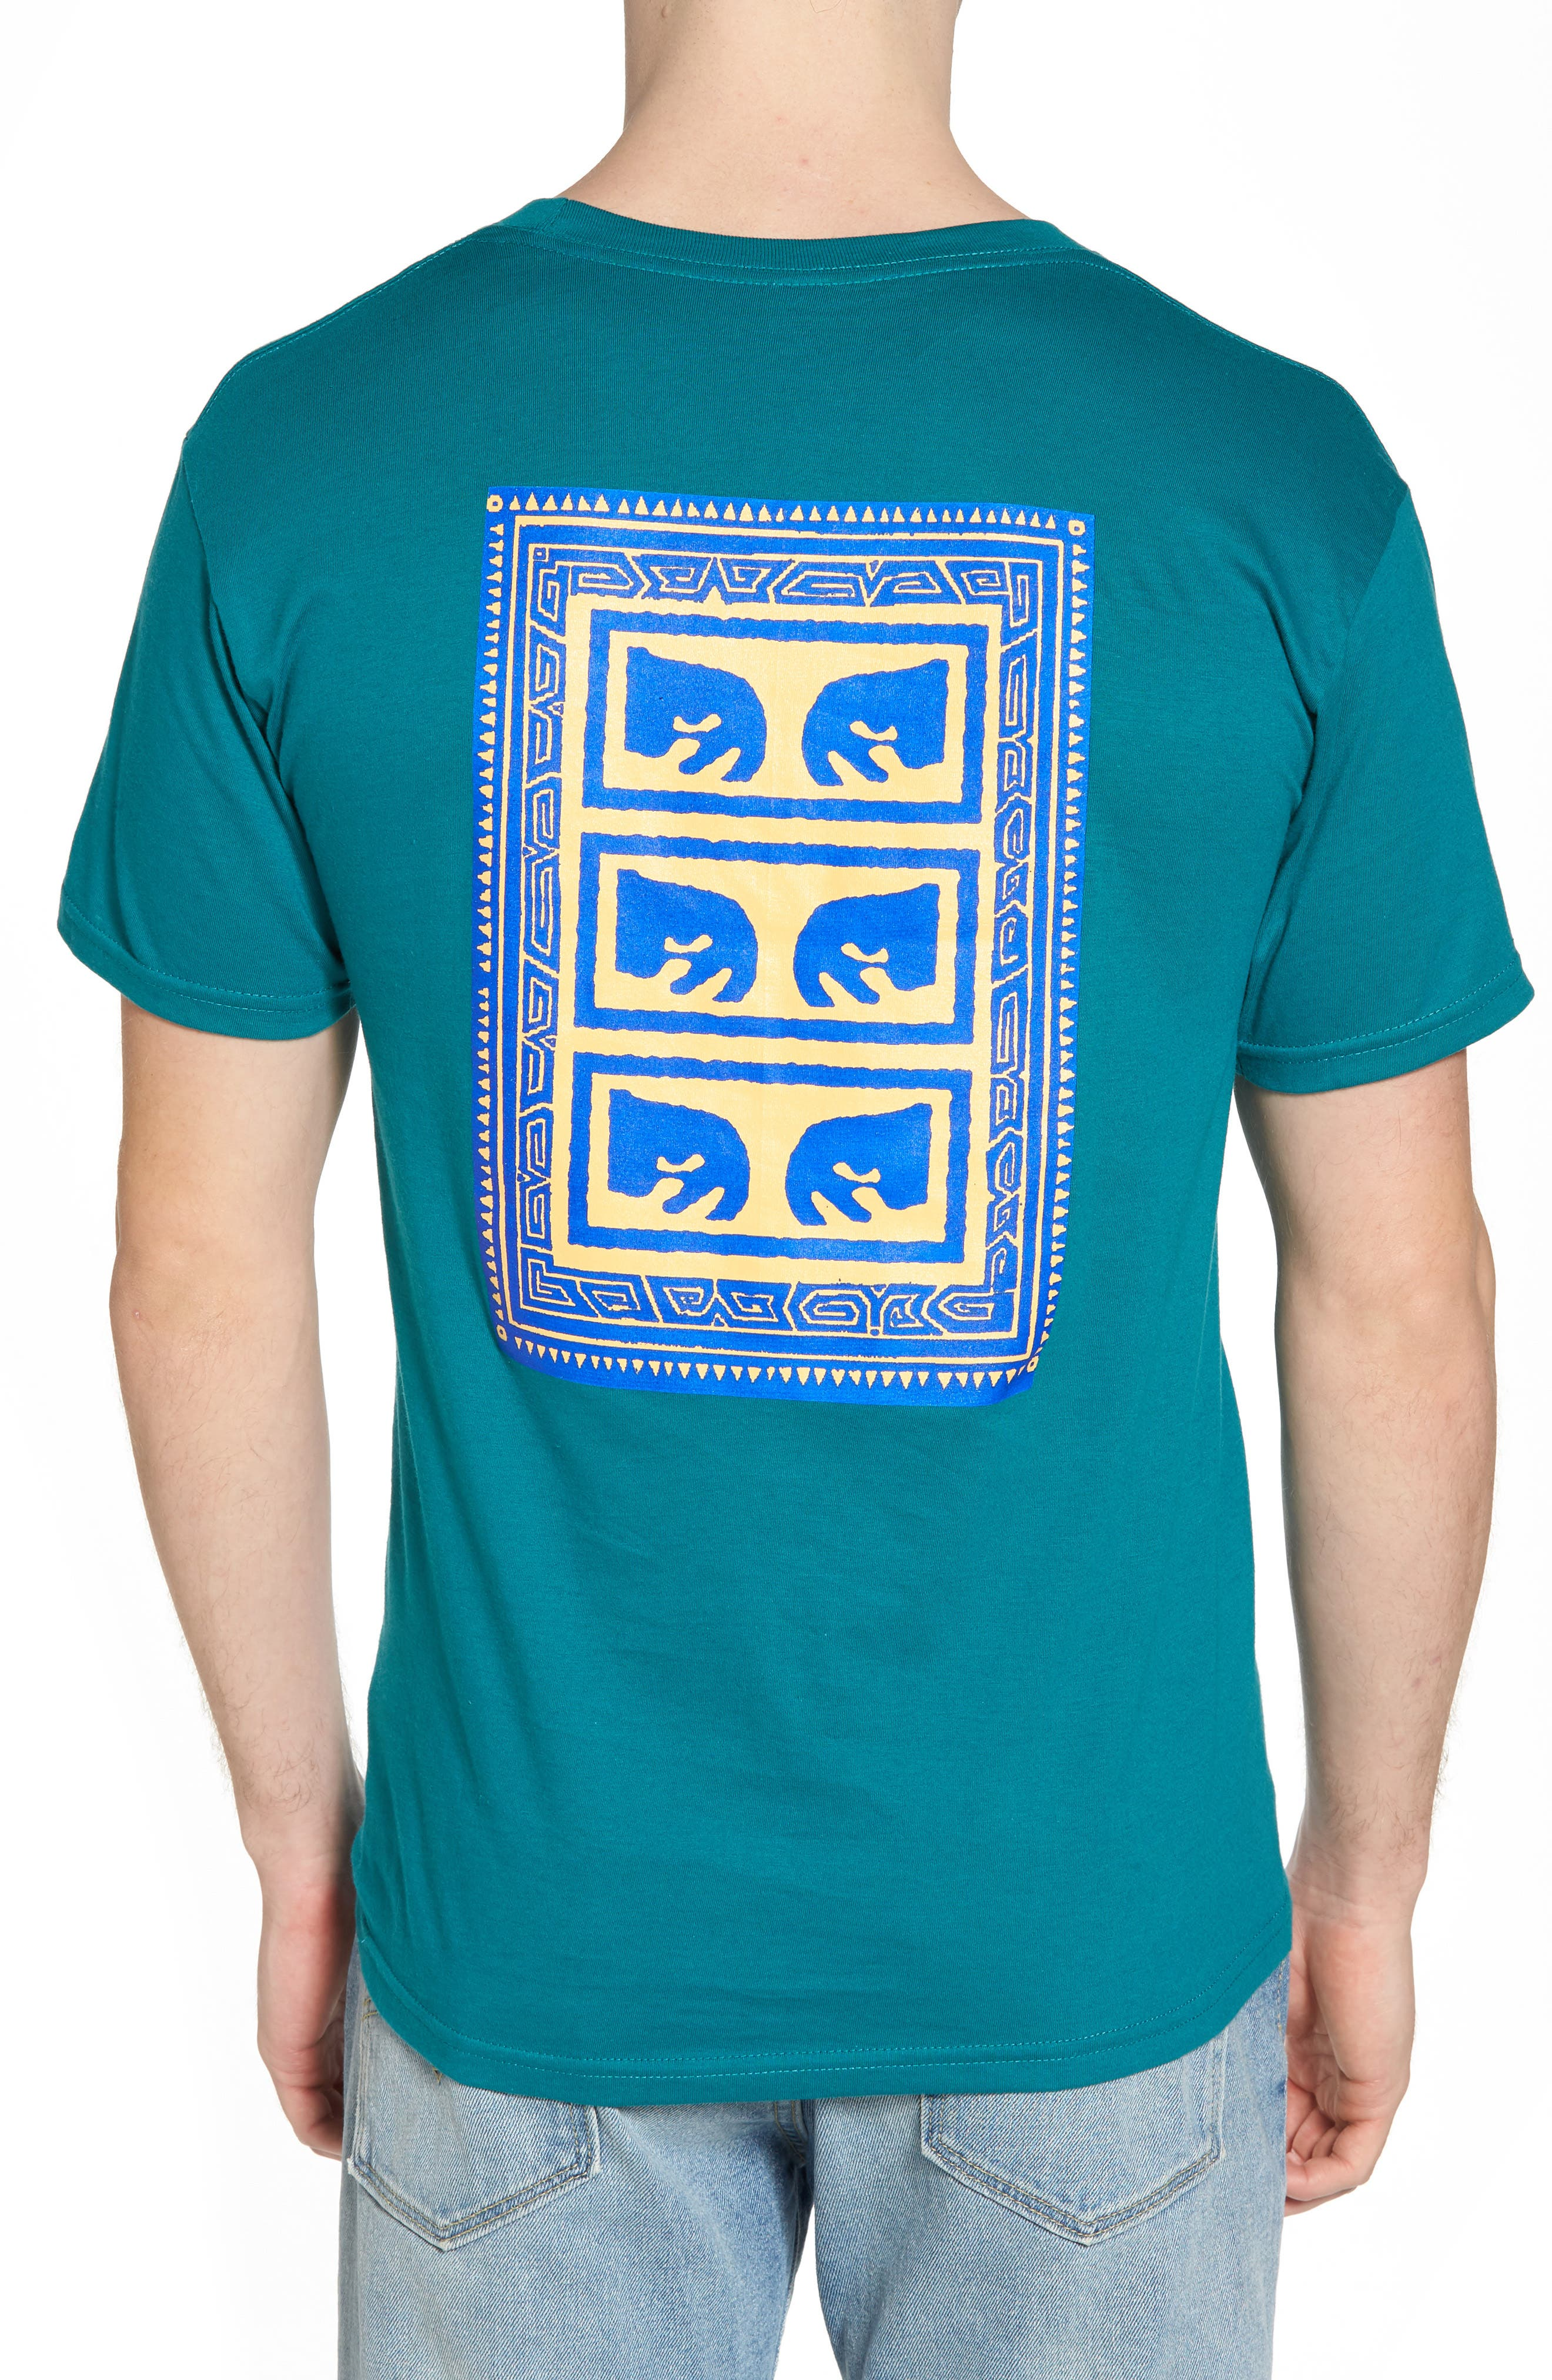 Flashback Graphic T-Shirt,                             Alternate thumbnail 2, color,                             445